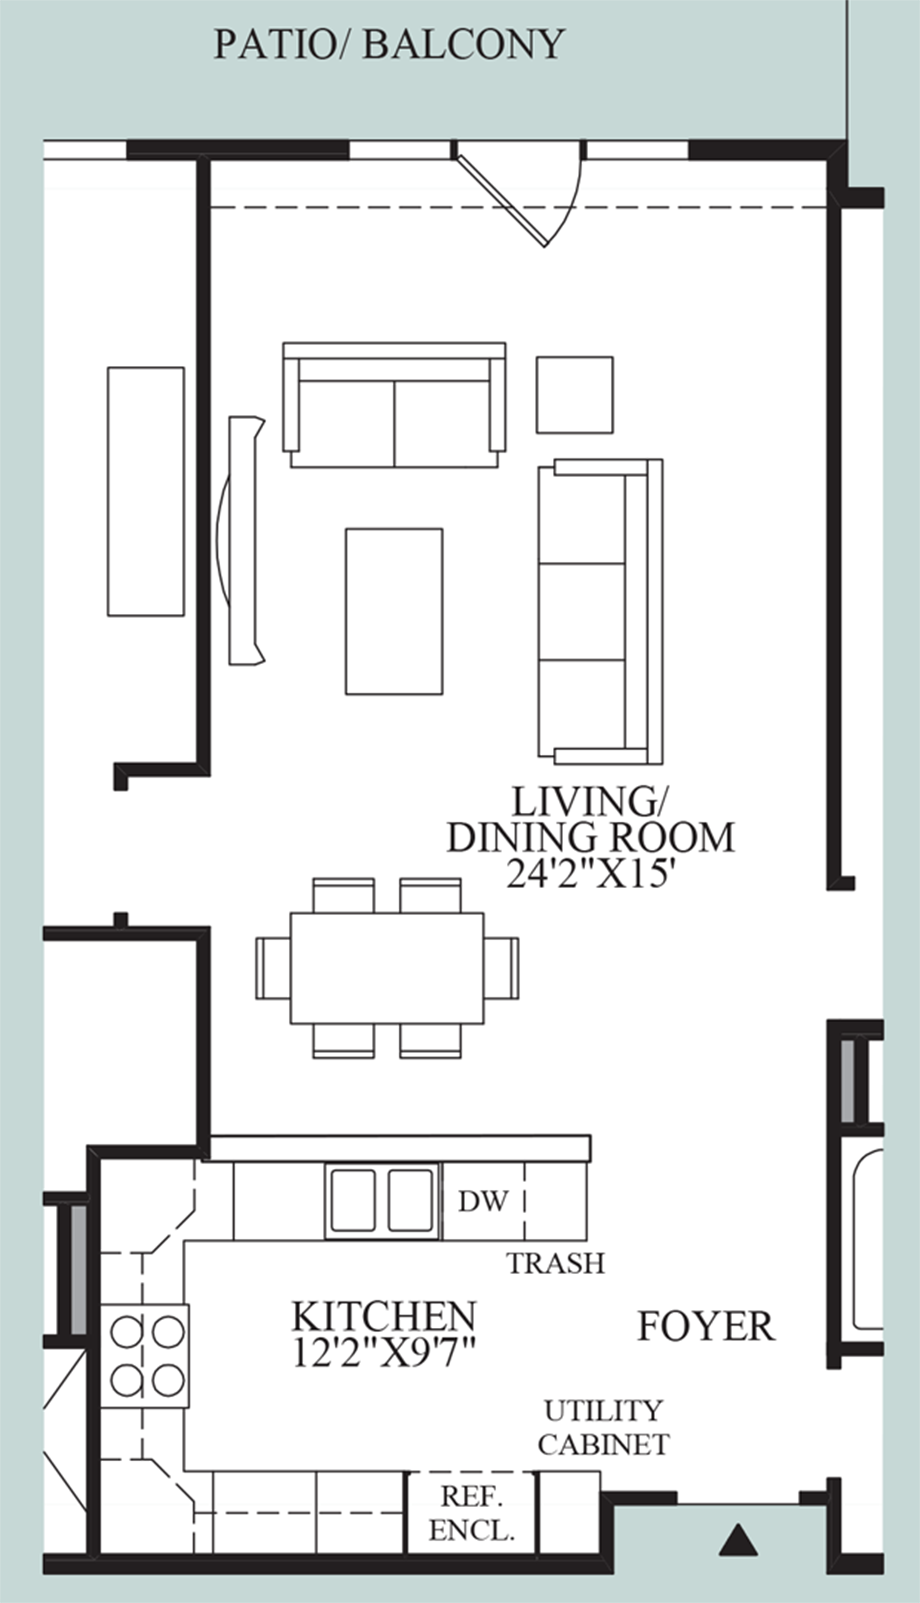 Patio/Balcony Floor Plan